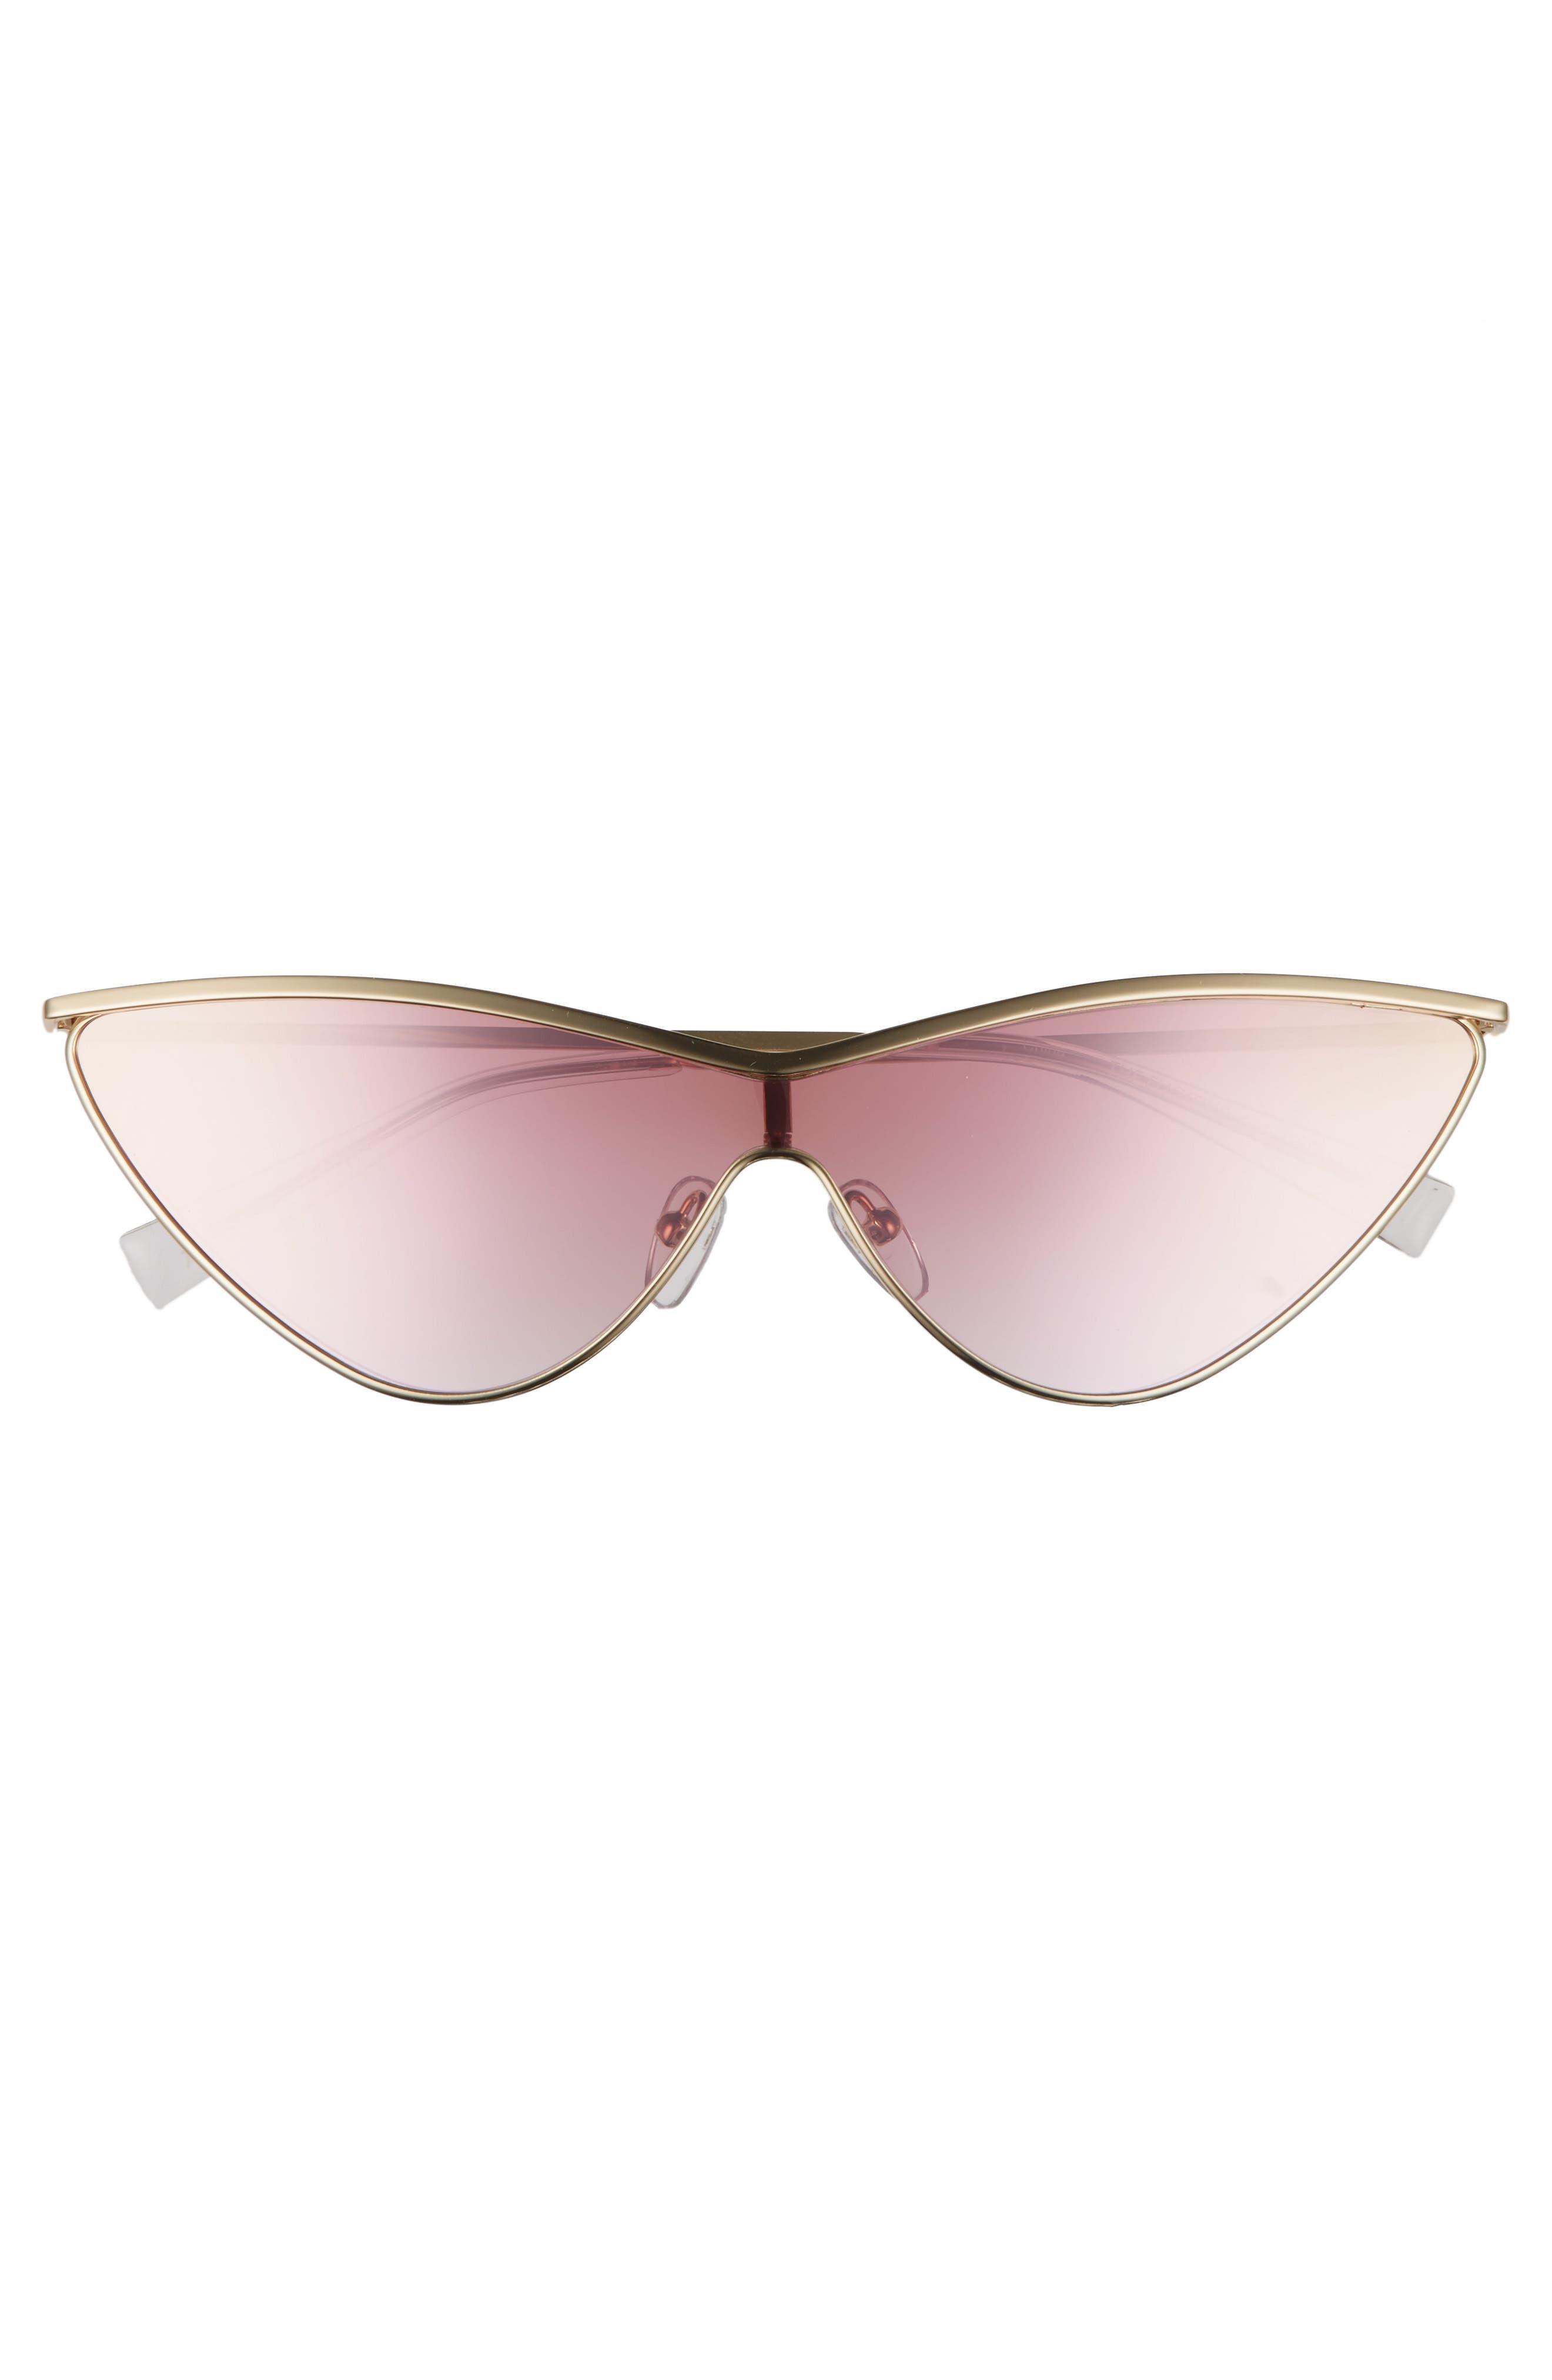 Alternate Image 3  - Adam Selman x Le Specs Luxe The Fugitive 71mm Sunglasses